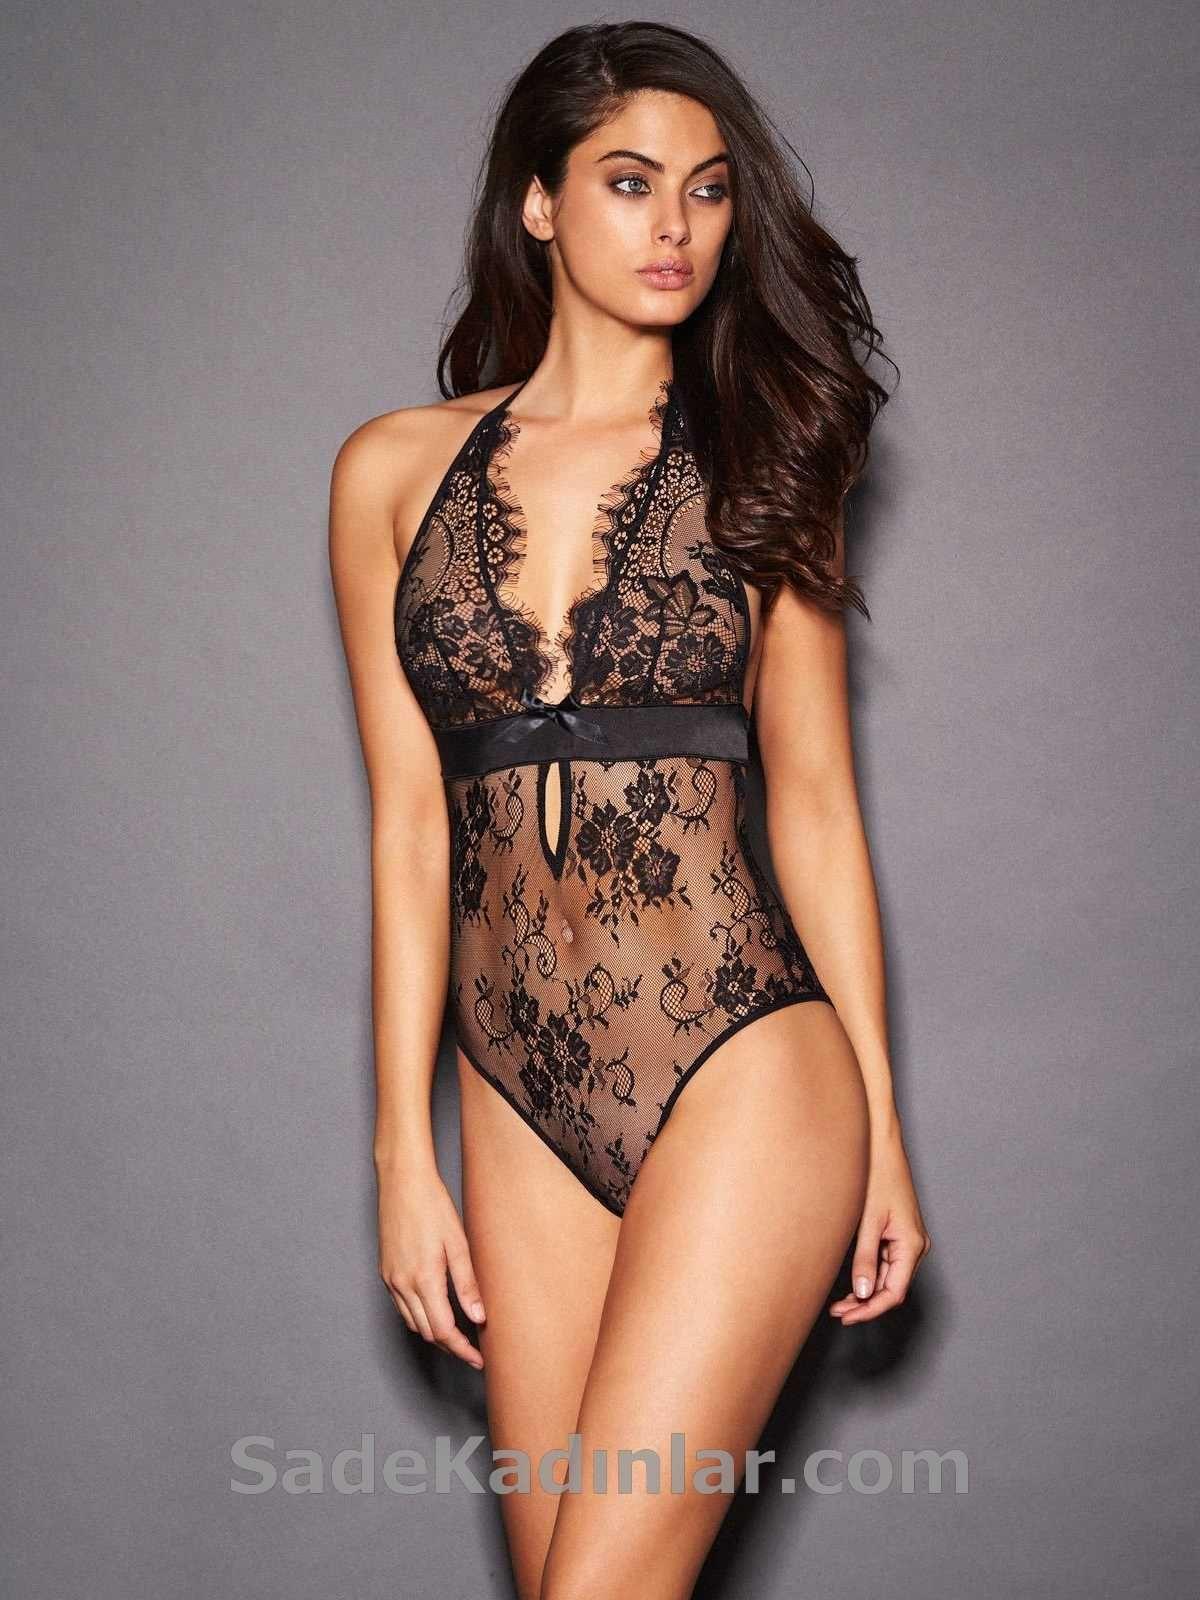 Bayan Ic Giyim Modelleri Siyah Transparan Dantelli Kadin Ic Giyim Moda Stilleri Giyim